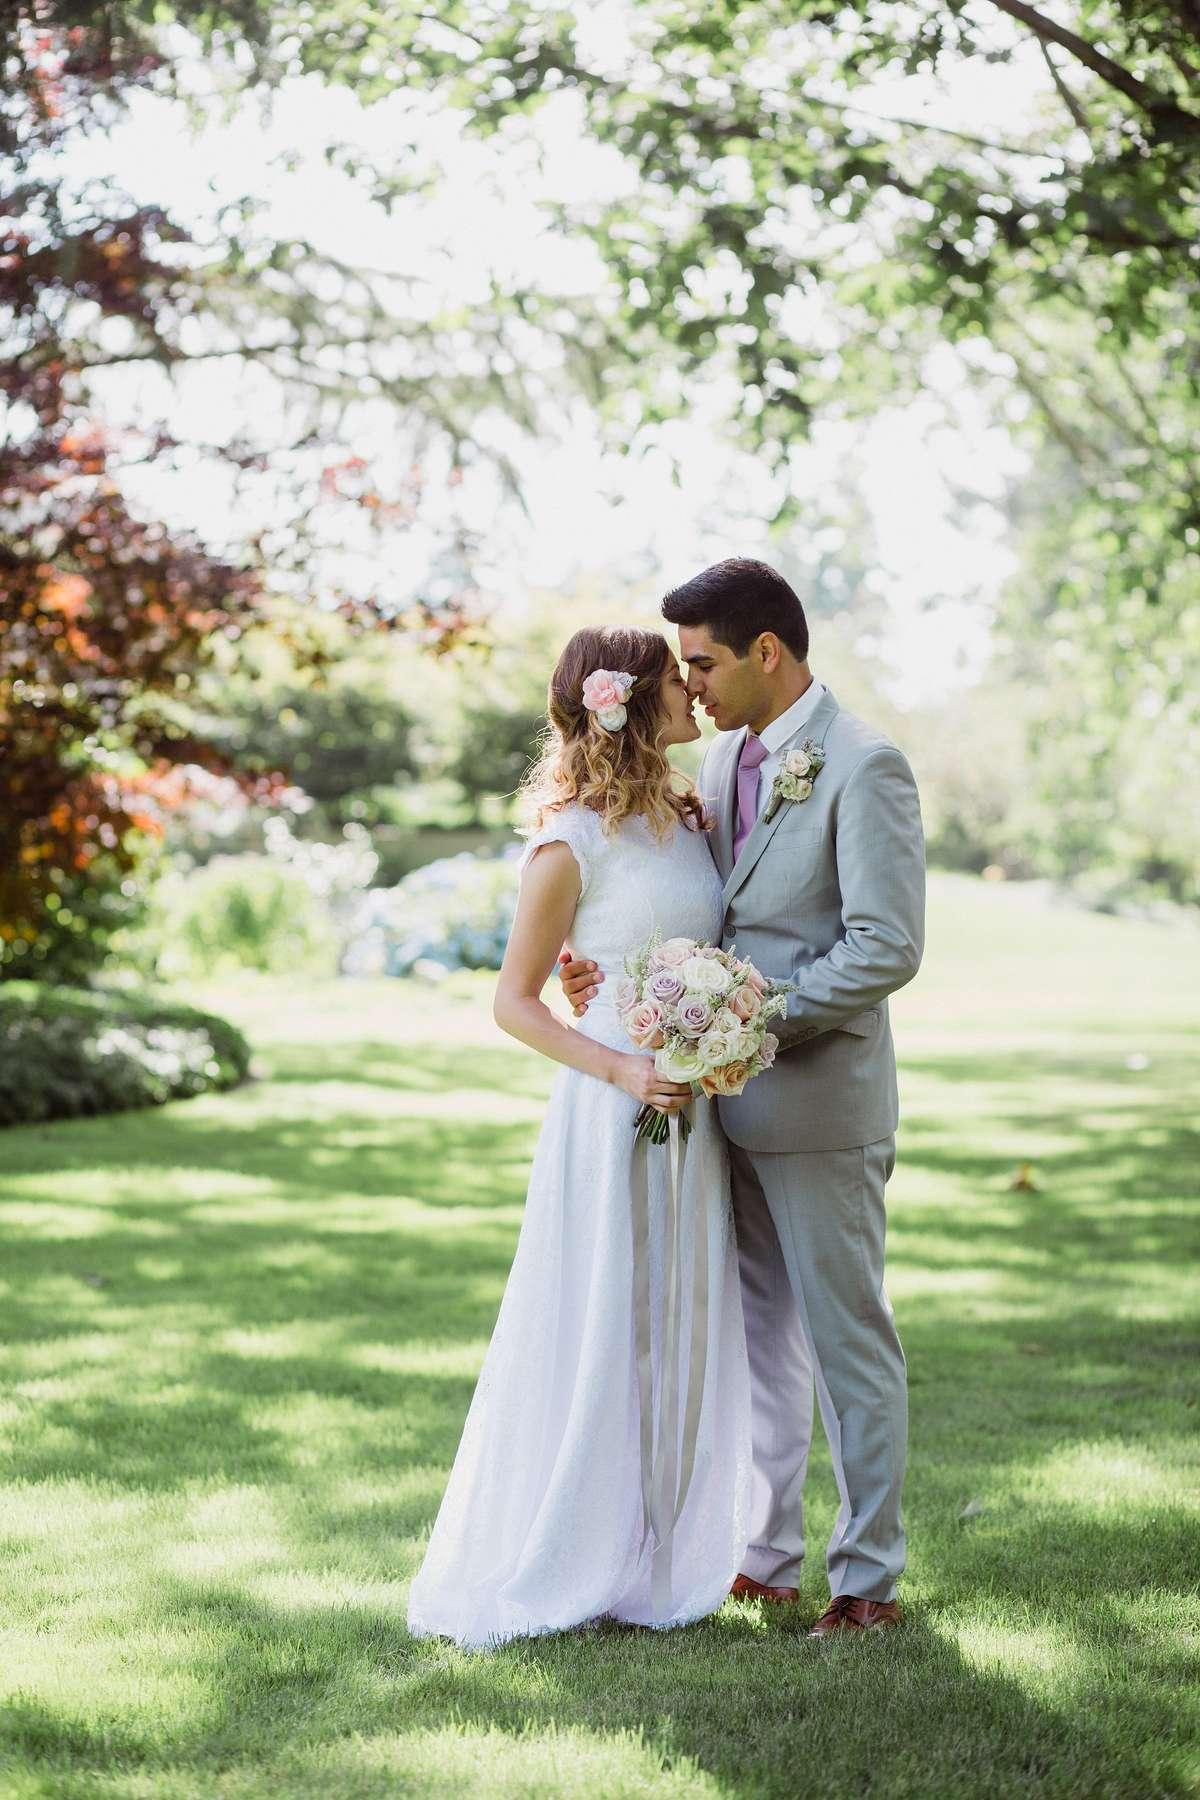 Seattle-LDS-Wedding-Photography-004.jpg